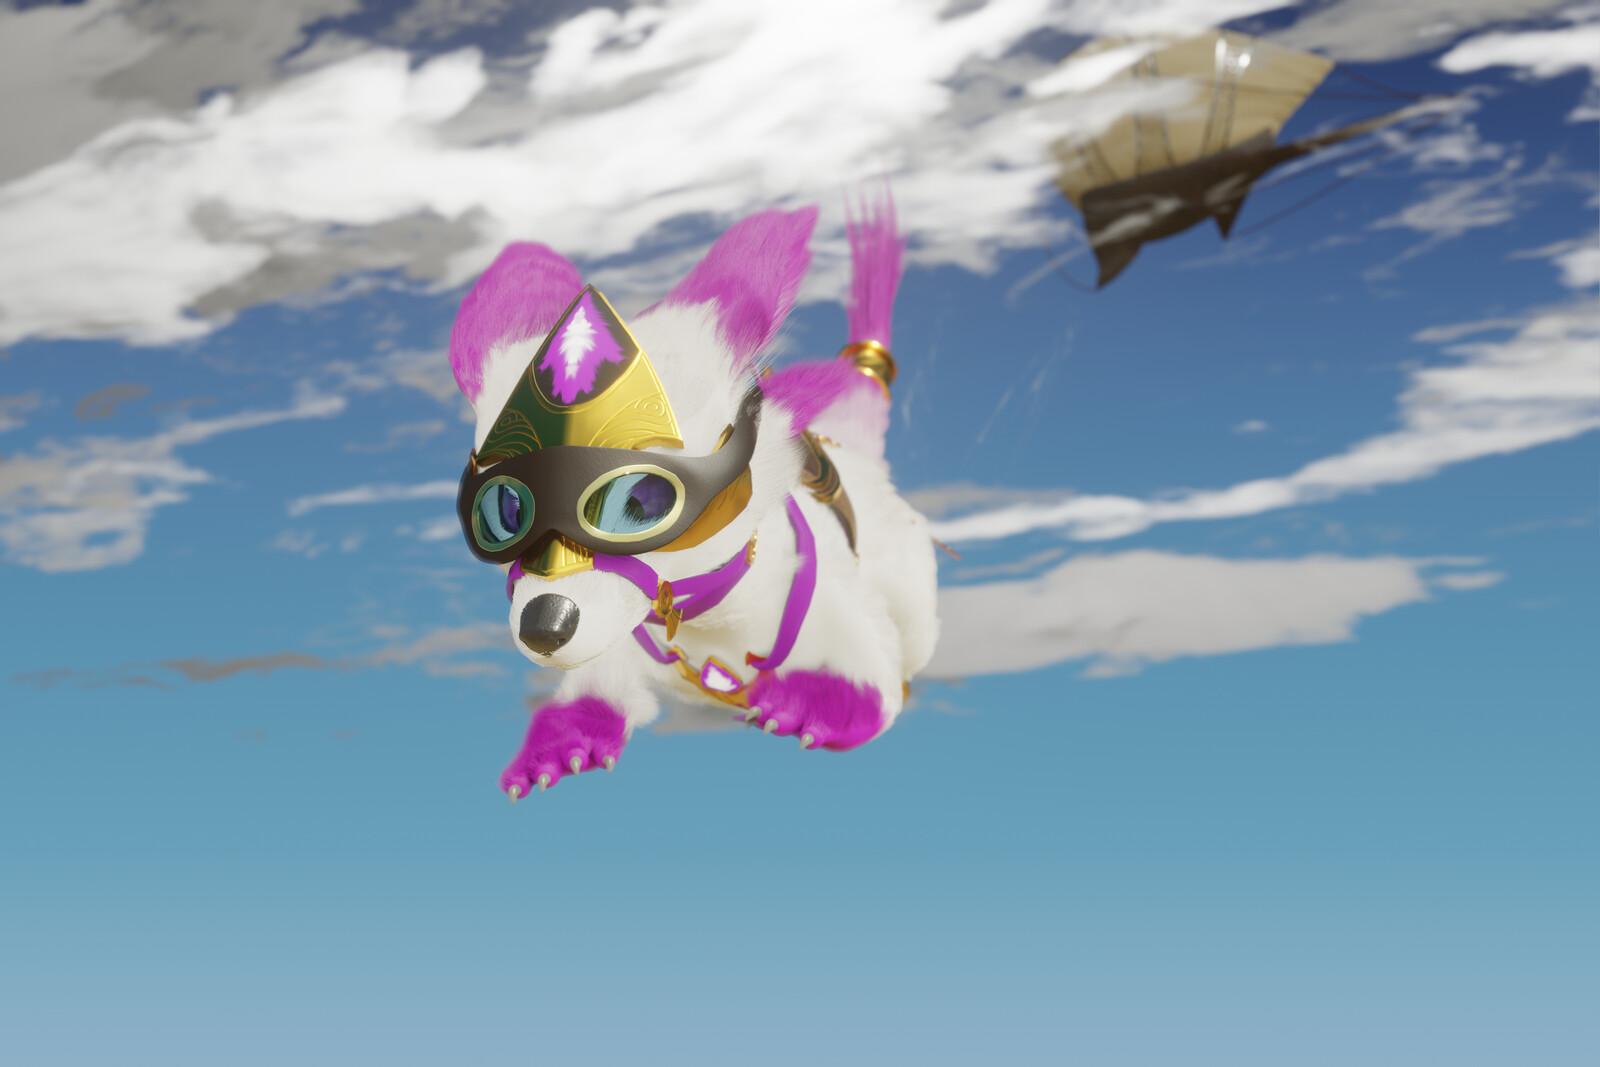 Charrtober 11 - Airdrop